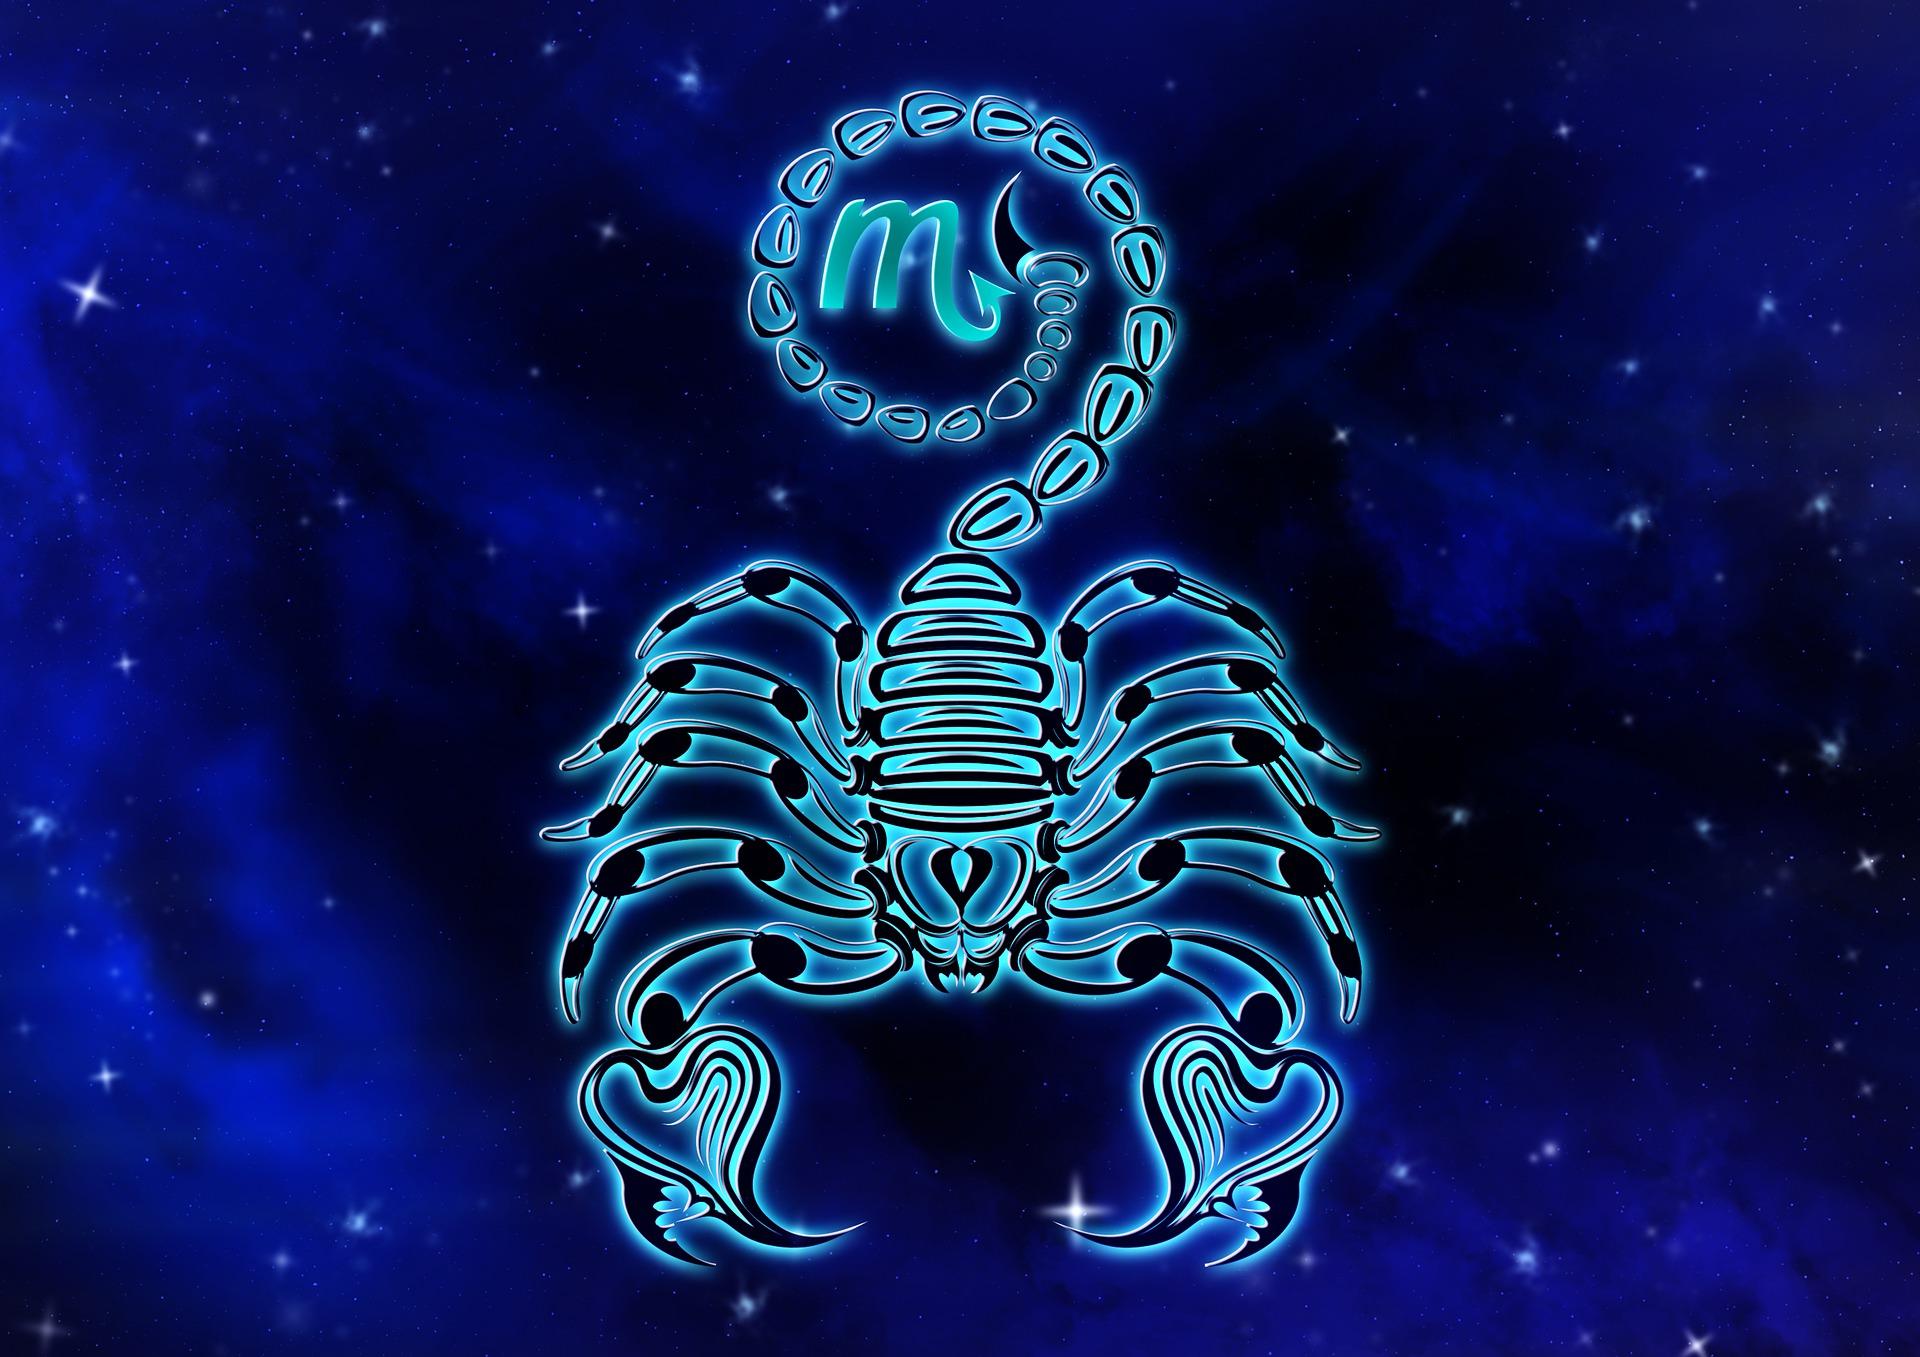 Horoscop săptămânal Minerva 7-13 septembrie 2020 - Scorpion